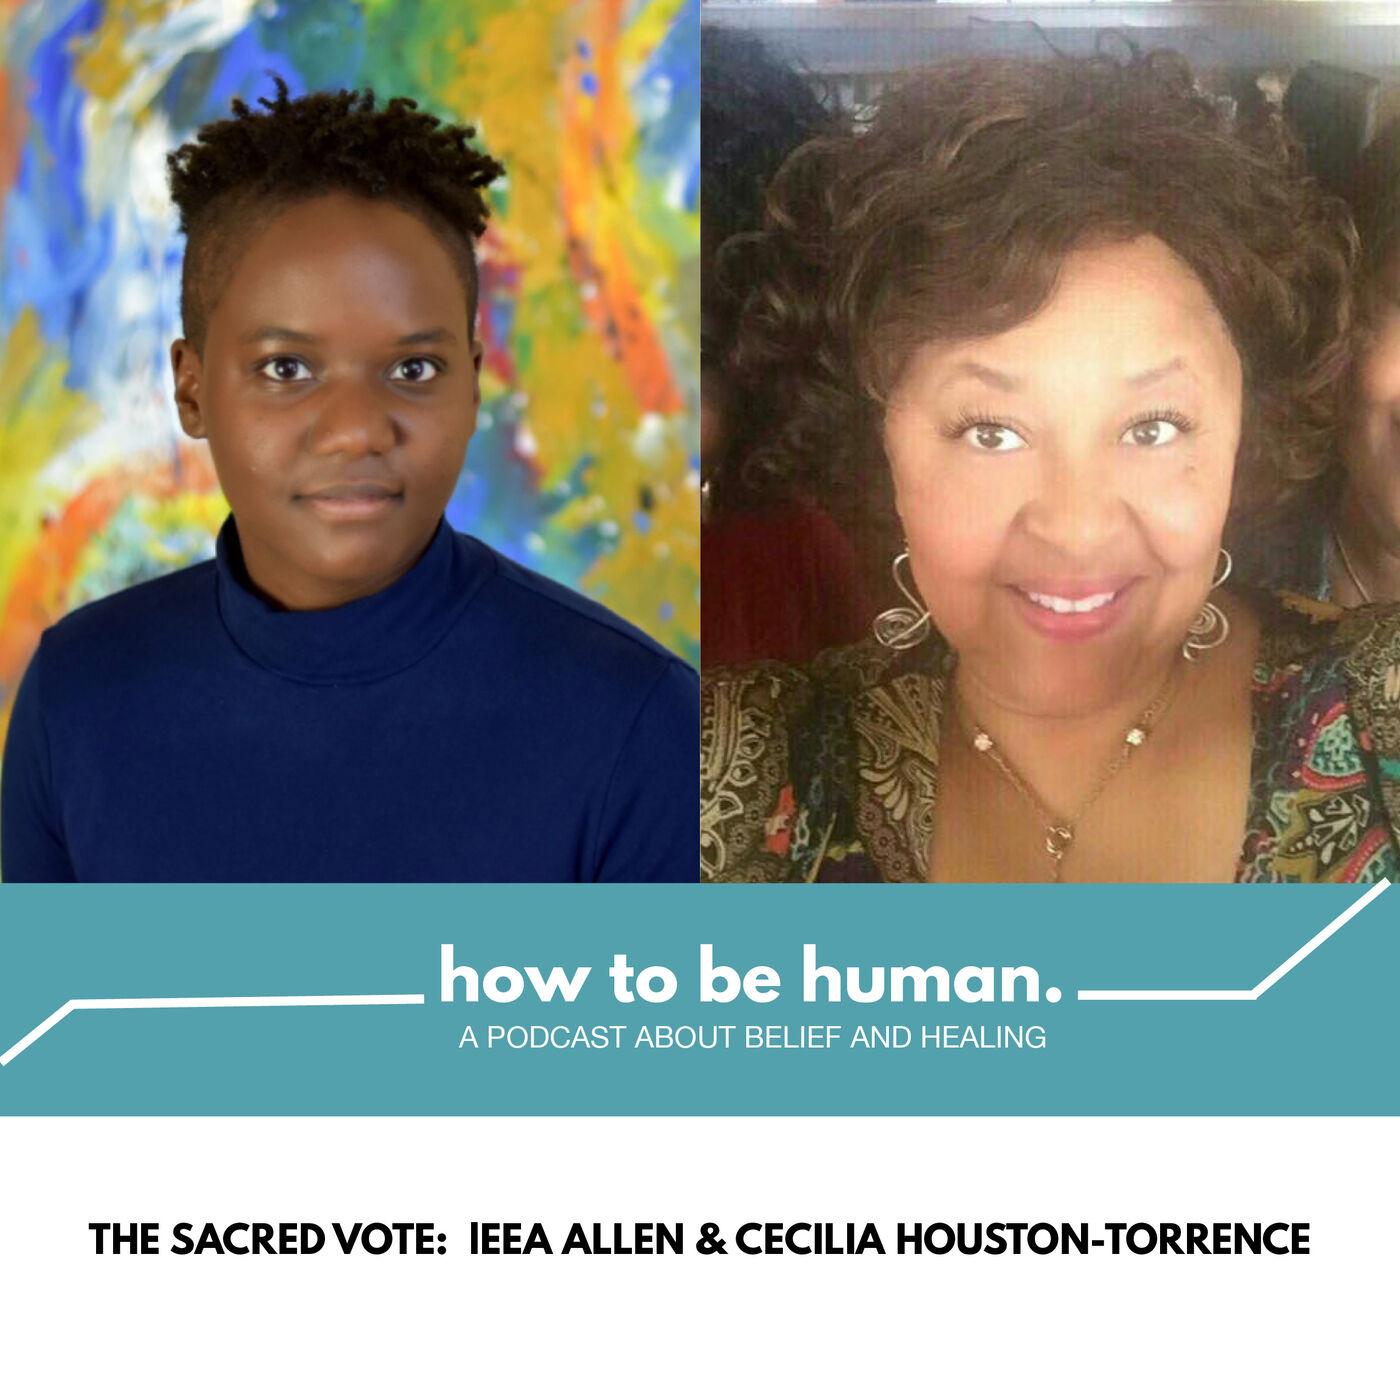 The Sacred Vote: leea Allen & Cecilia Houston-Torrence